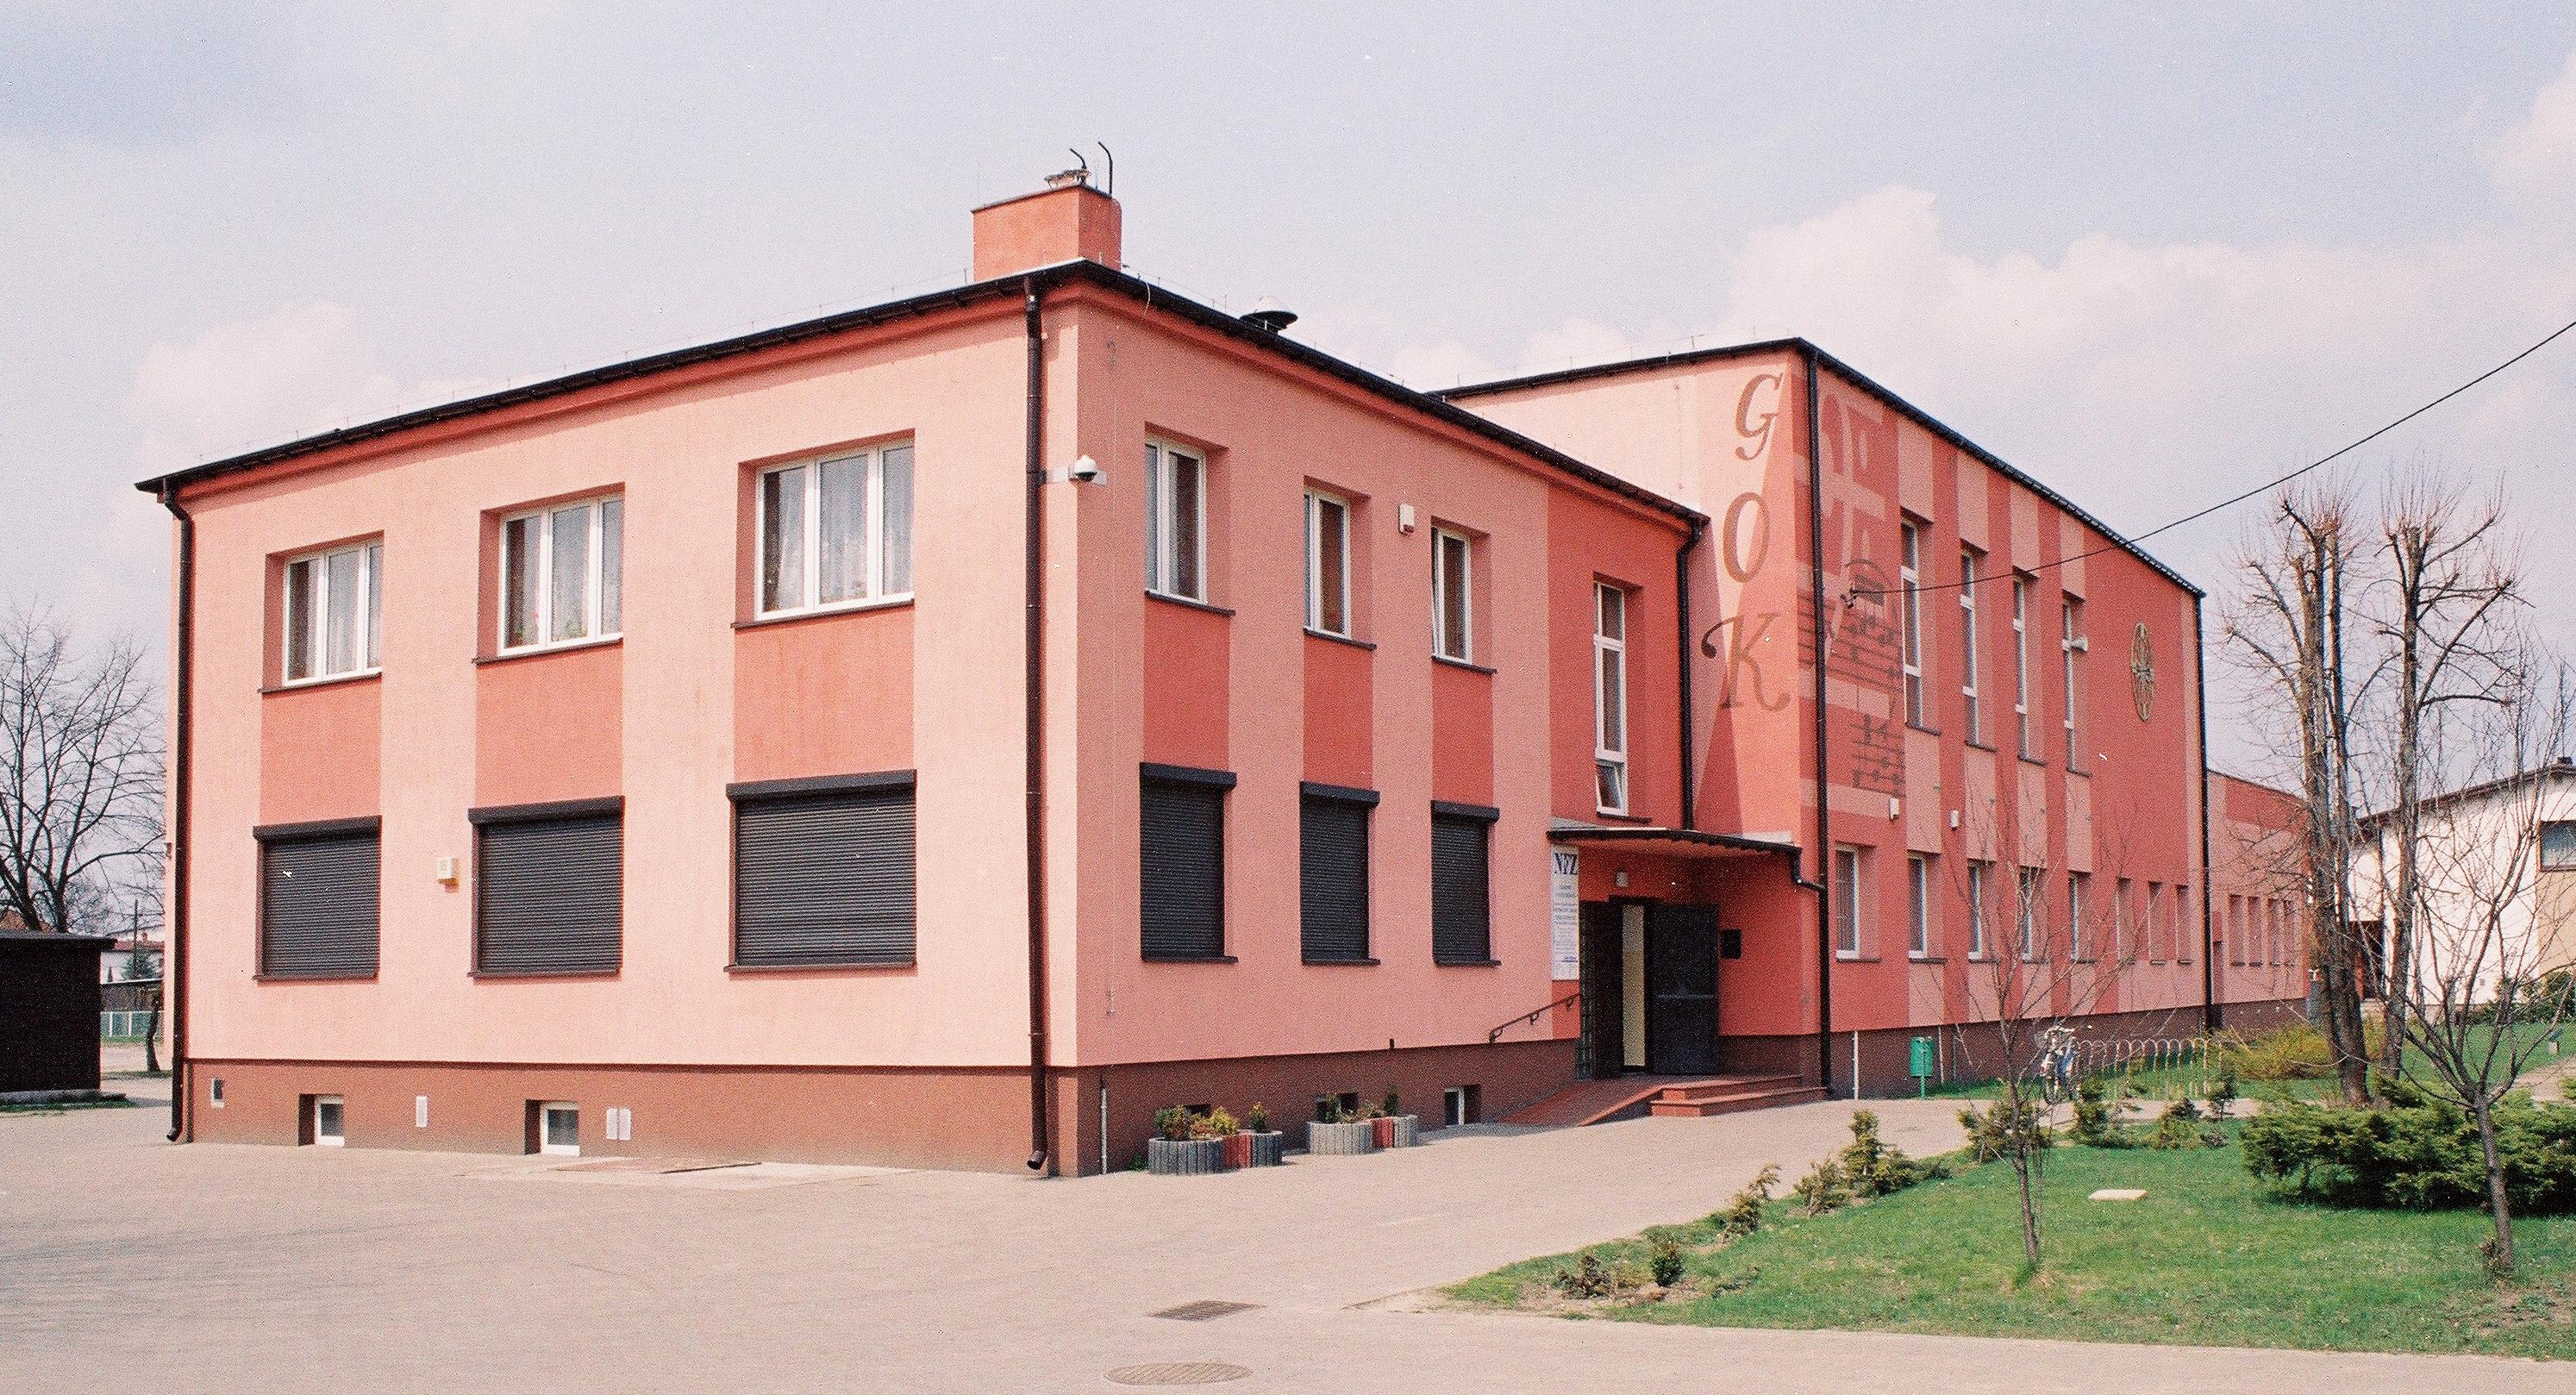 Boronow City